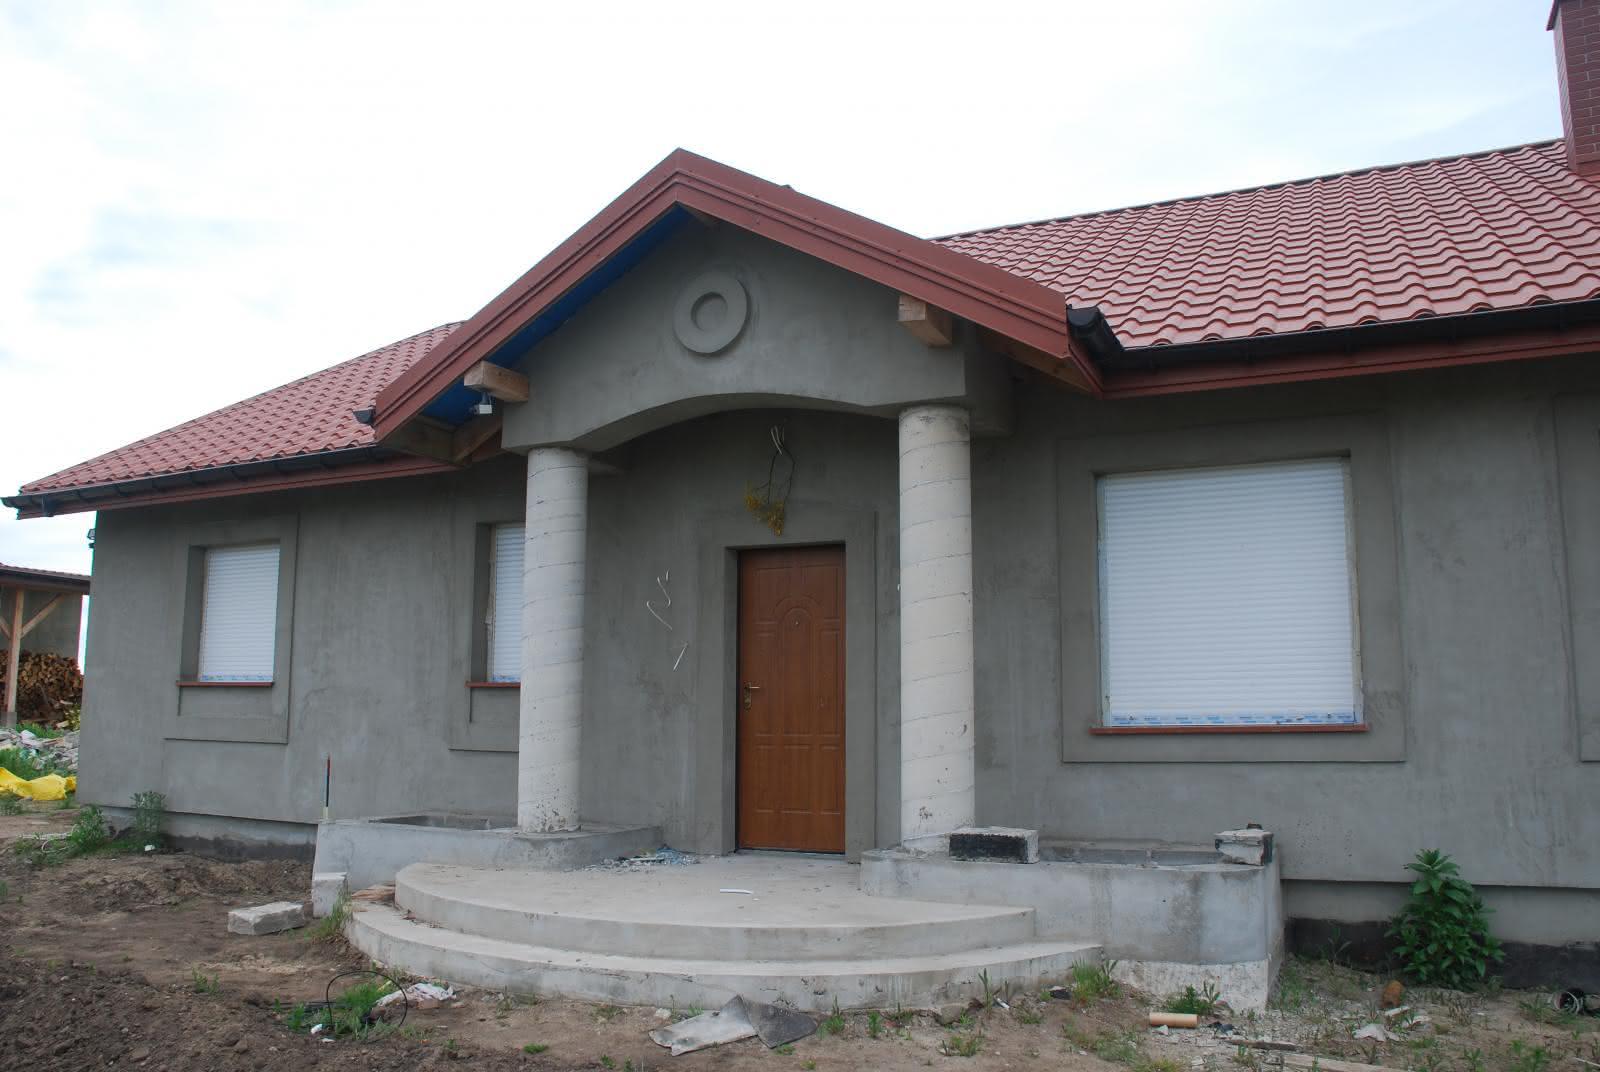 Sielanka - Horyzont - newmona